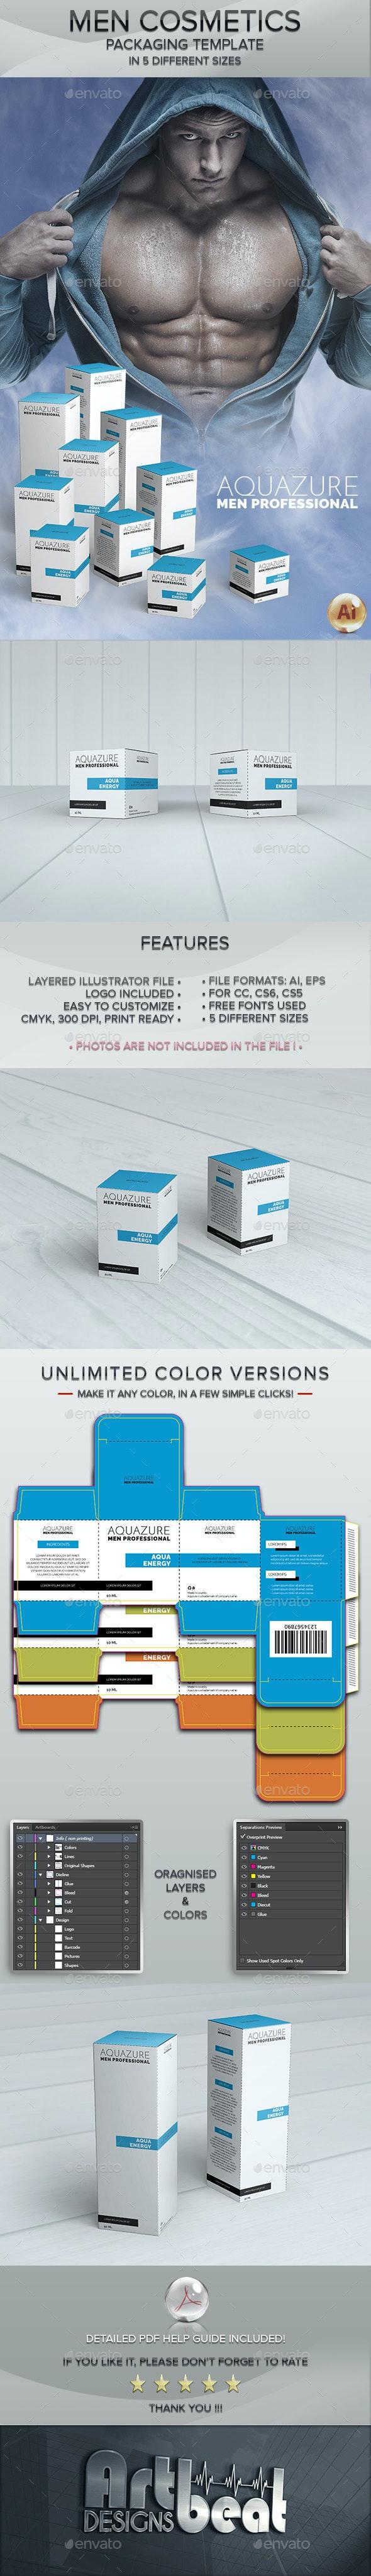 Men Cosmetics Box Templates - Packaging Print Templates